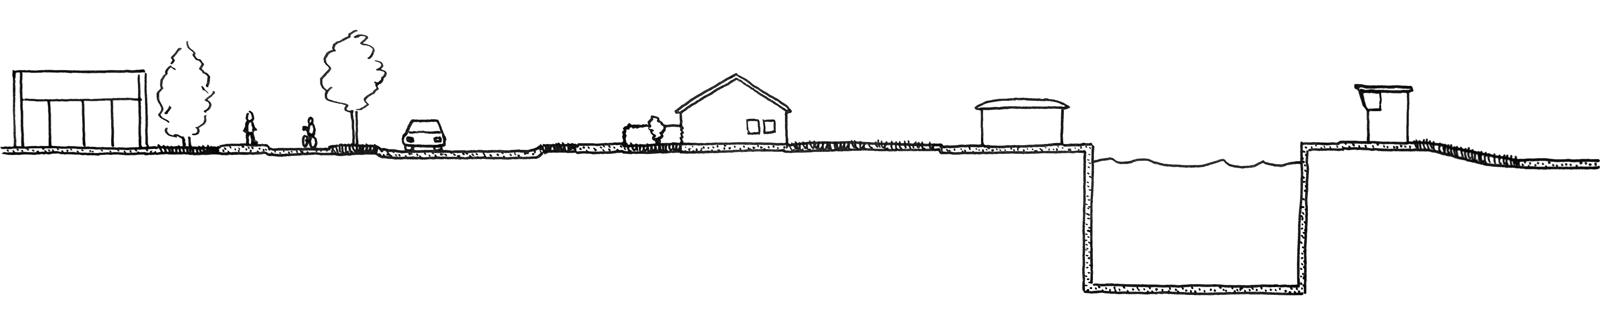 2015-sluis-doorsnede-wt.png